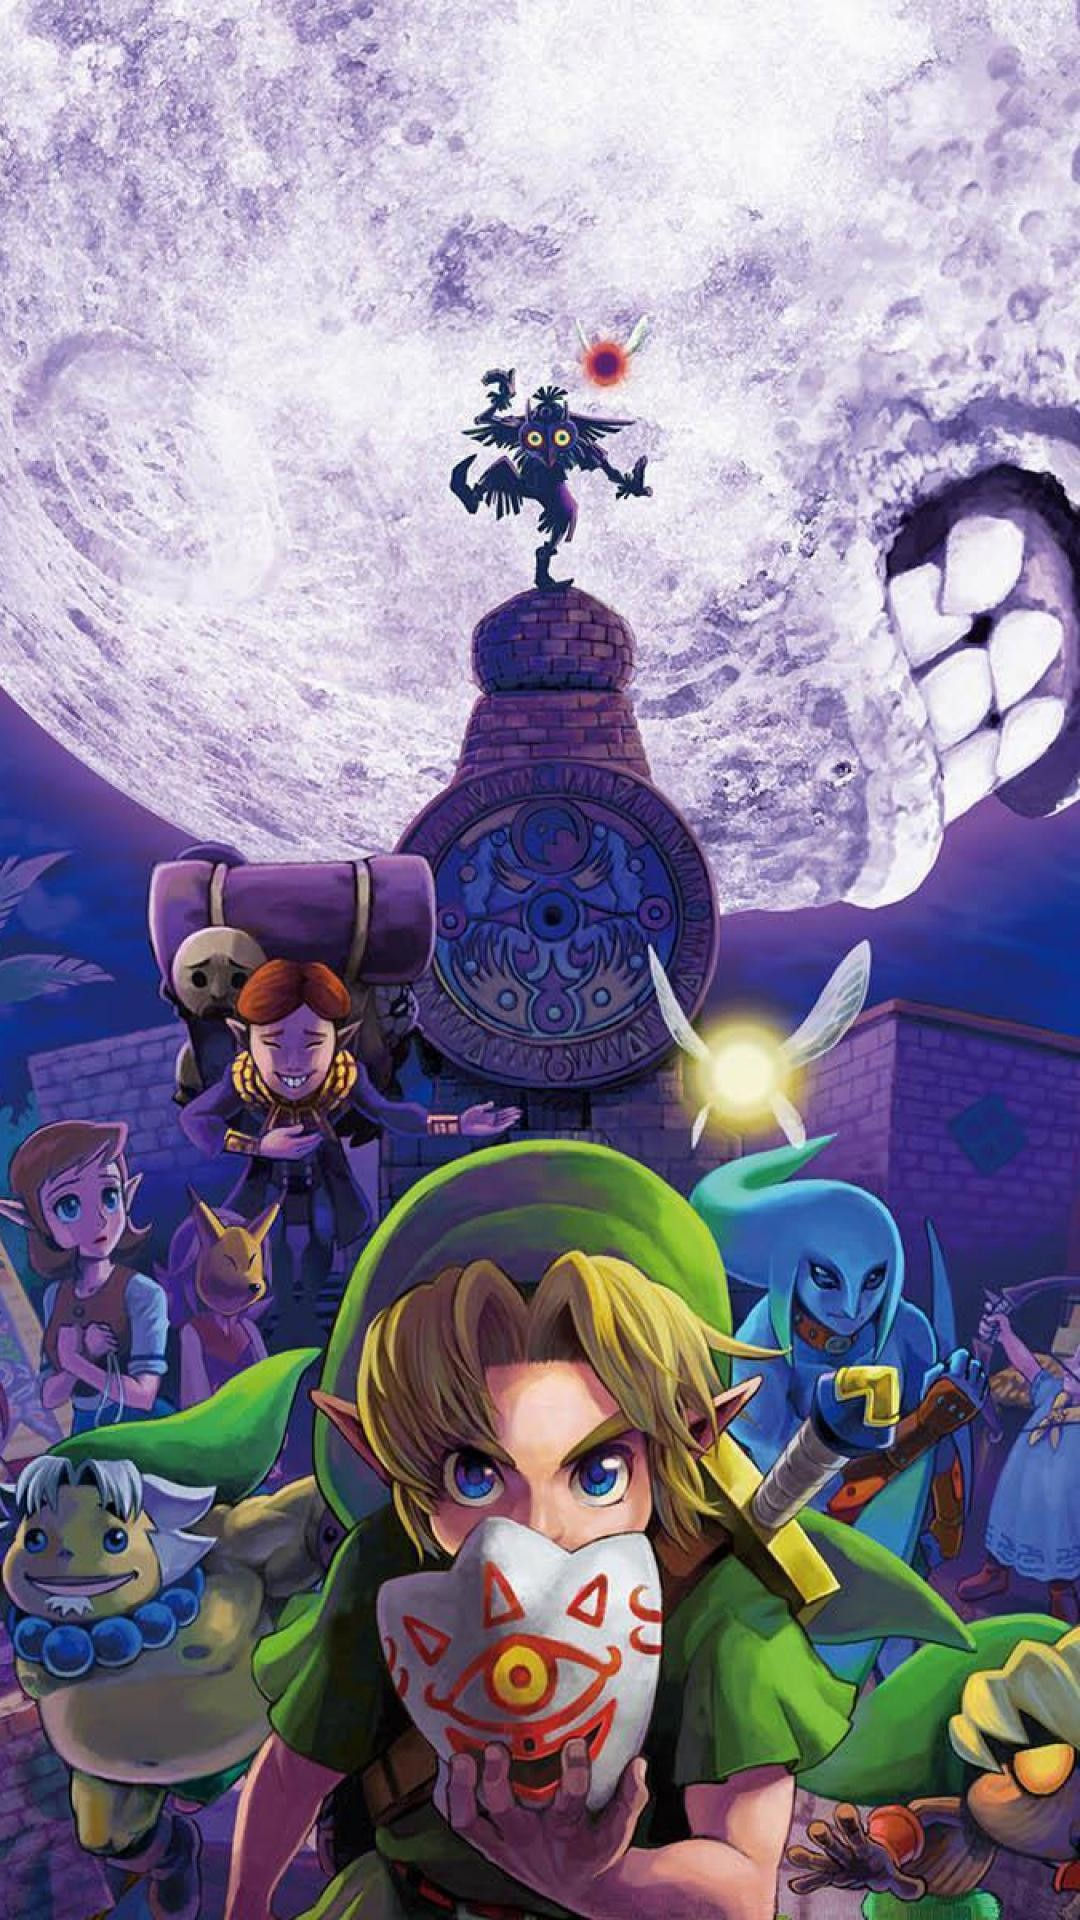 wallpaper.wiki-Zelda-Iphone-Wallpaper-Free-Download-PIC-